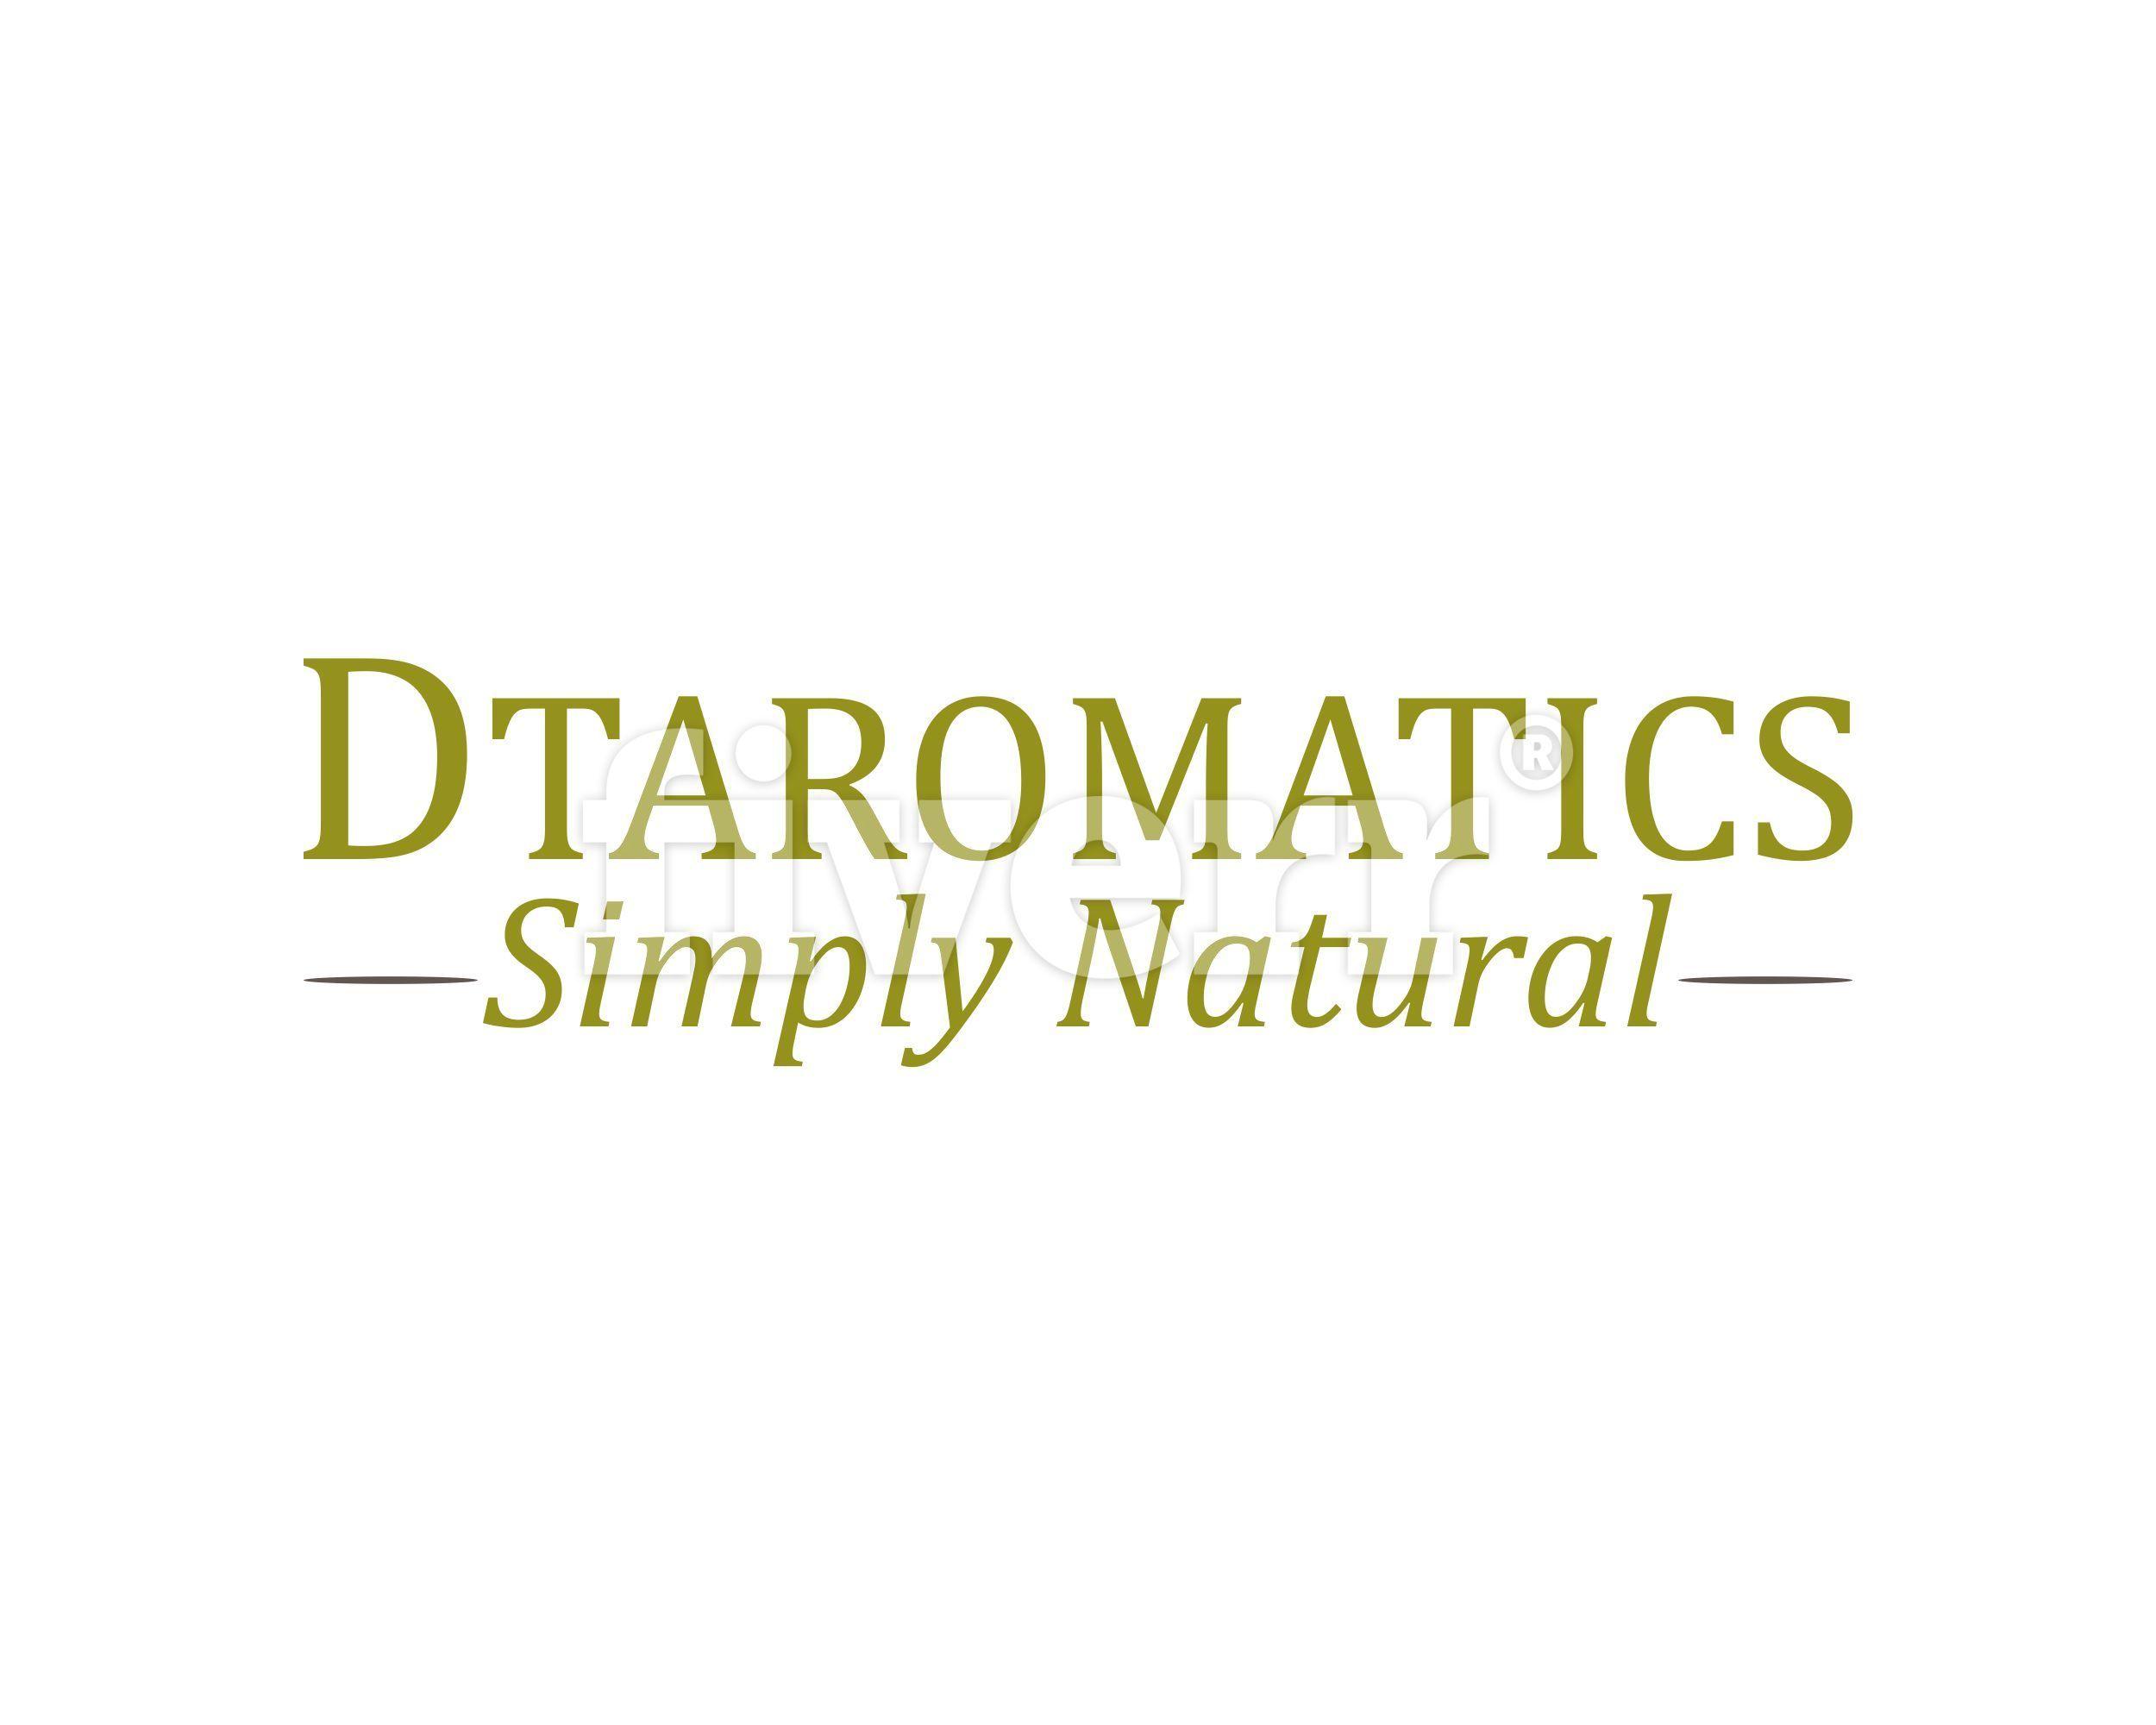 DTAROMATICS